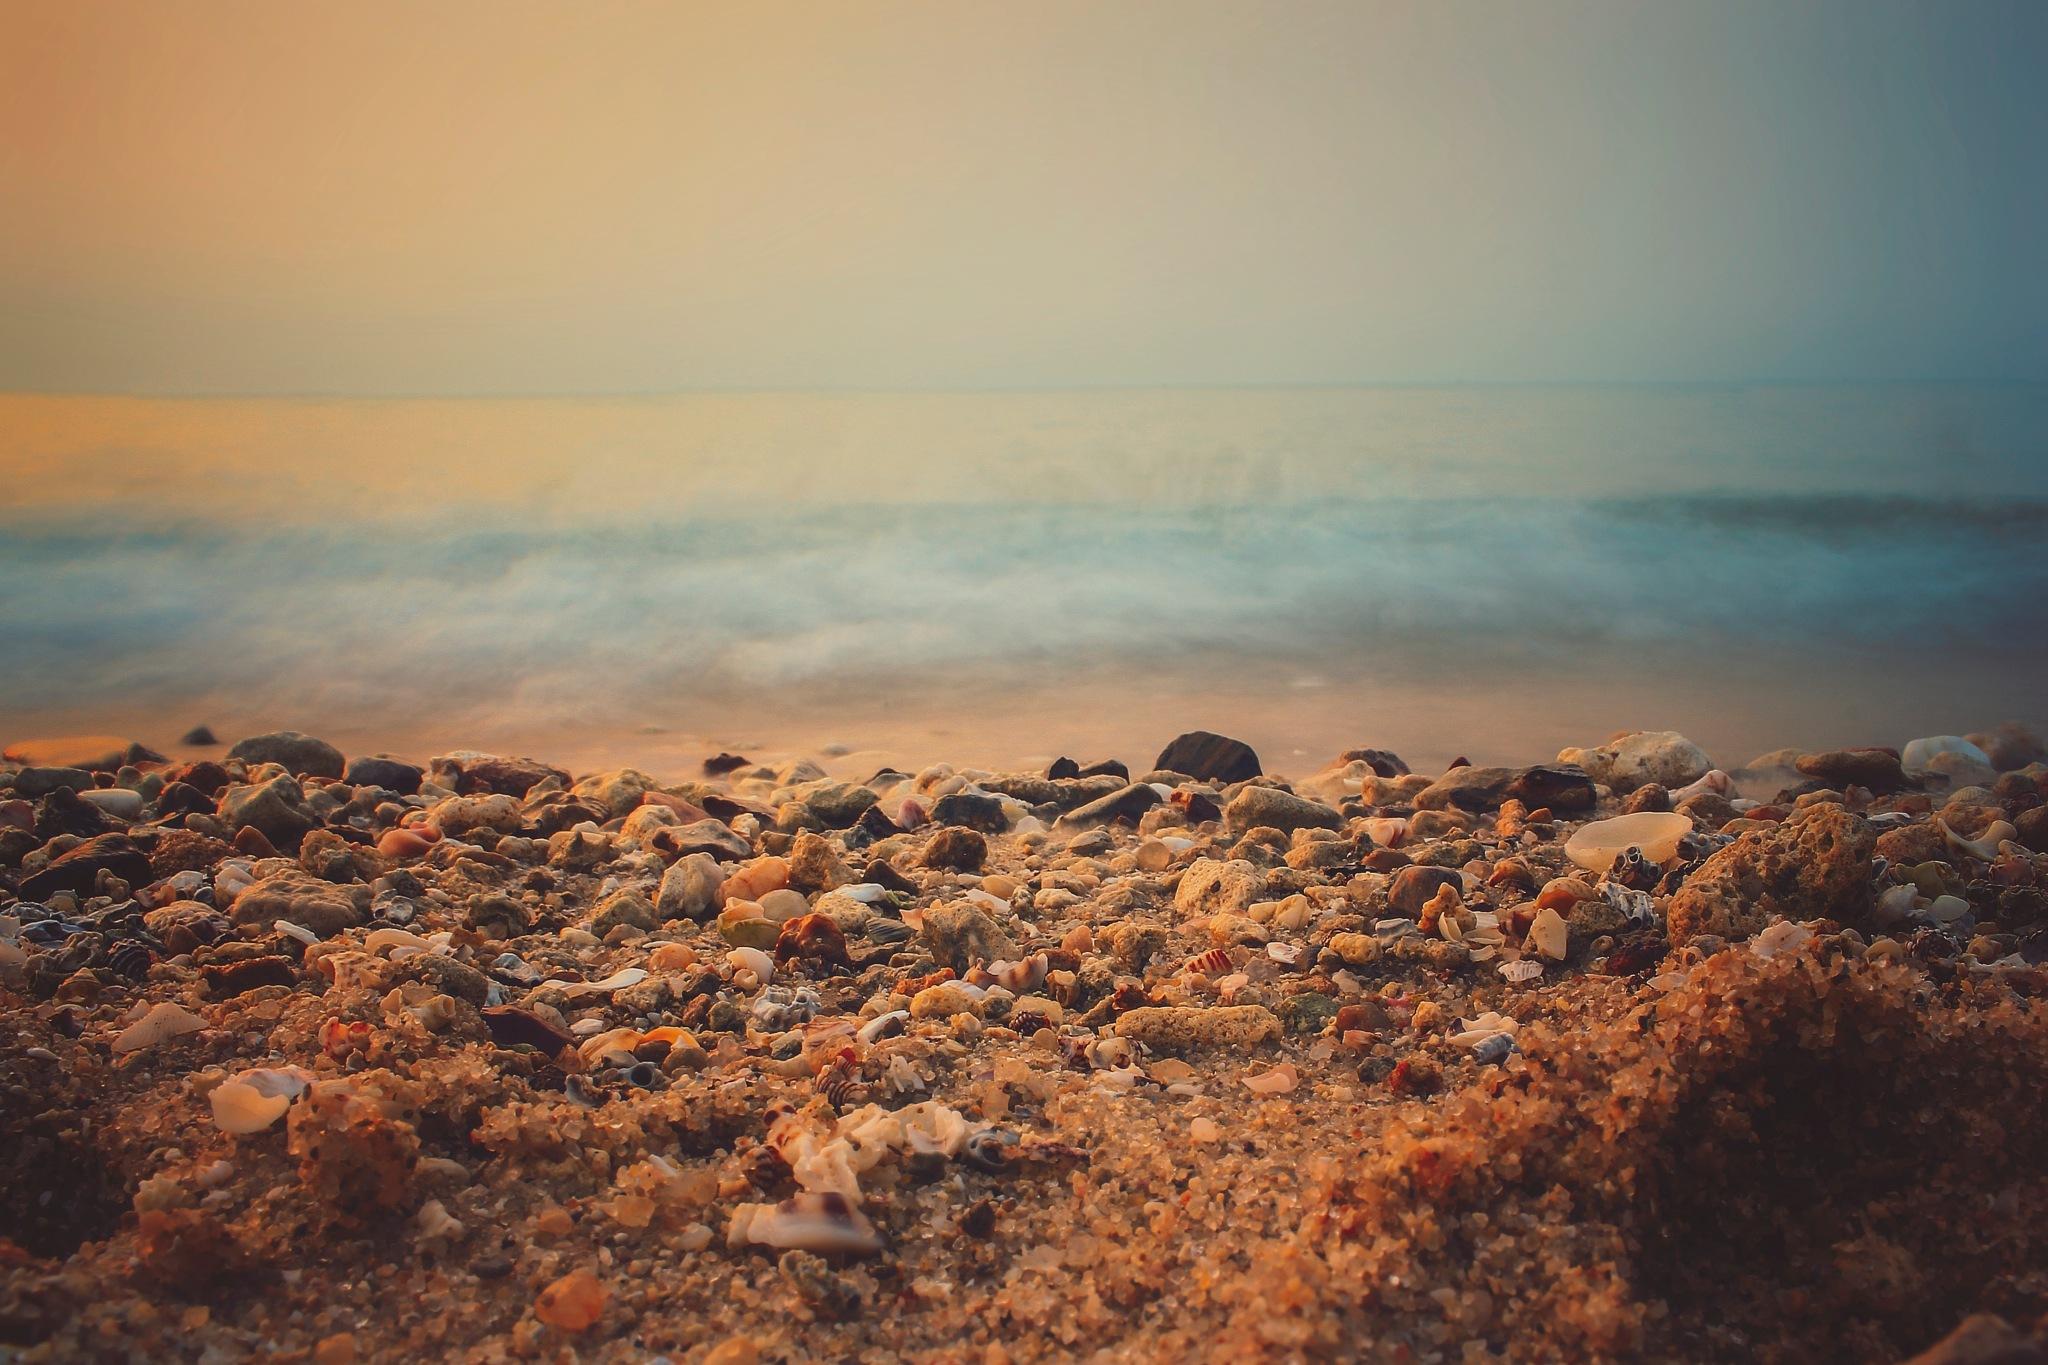 Sea side by Zeeshan Ashraf